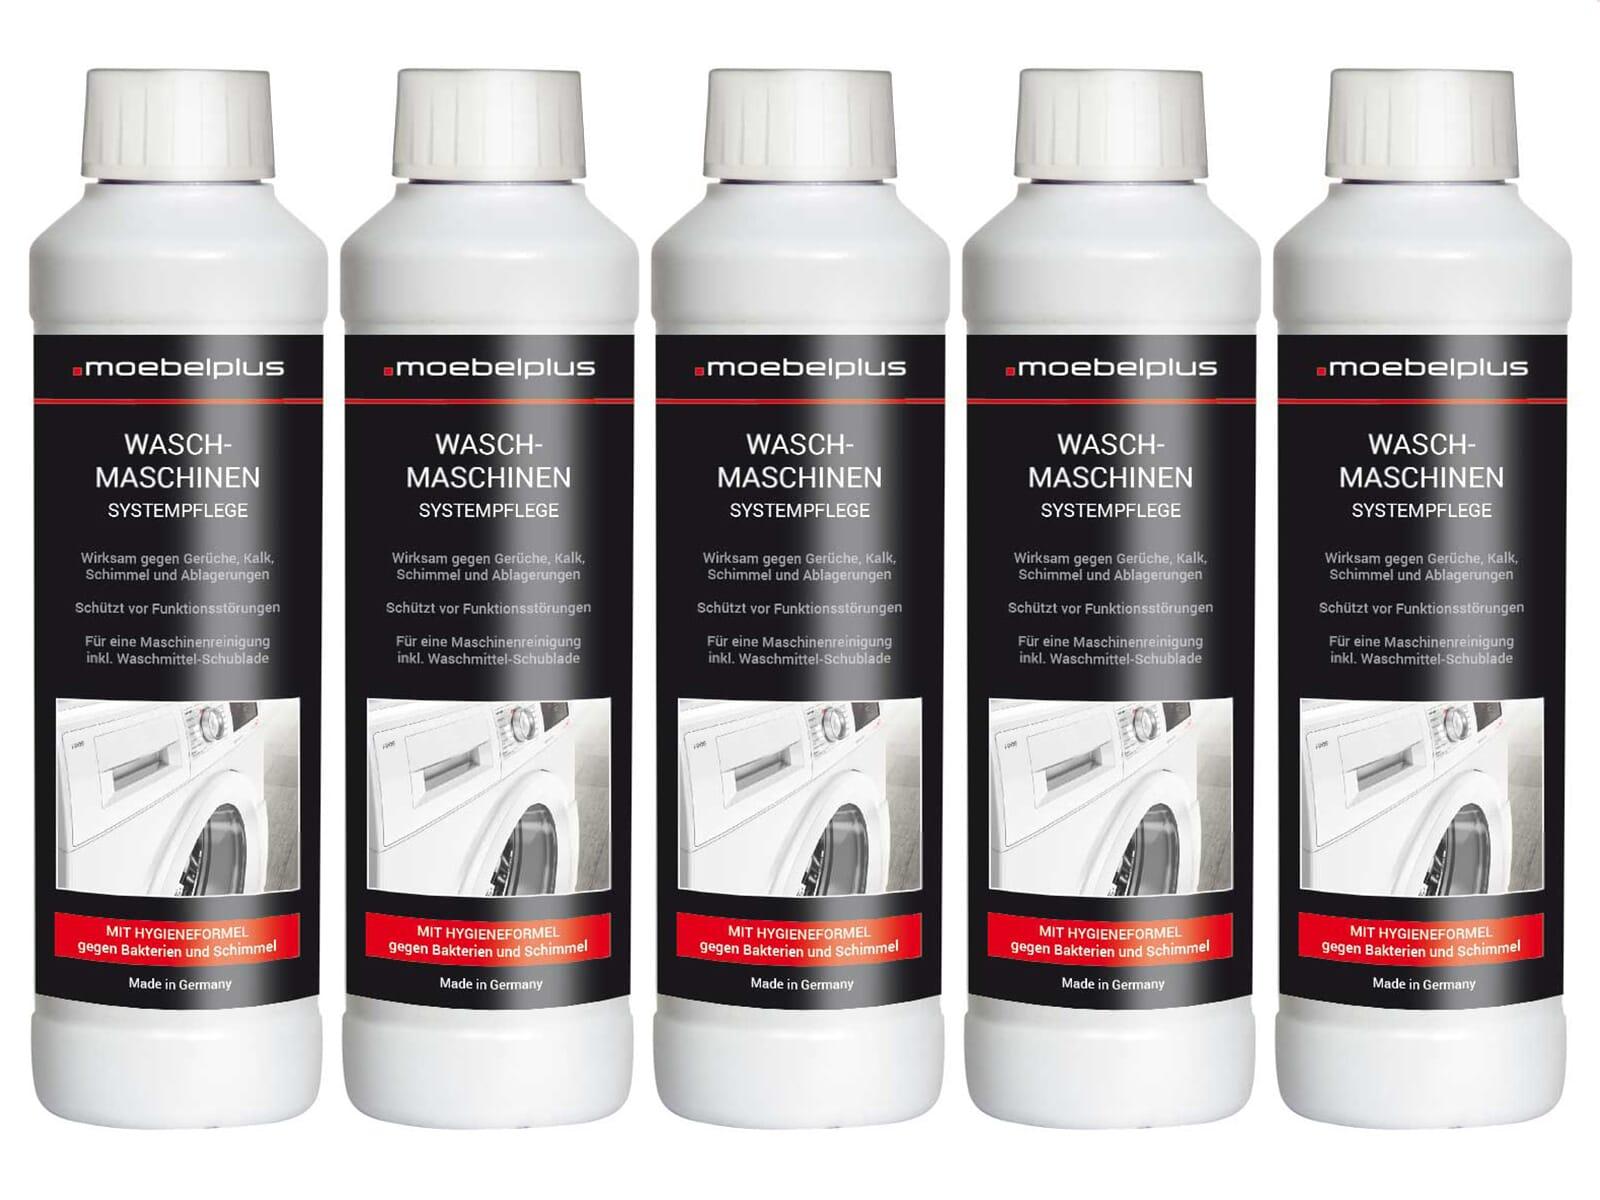 moebelplus Waschmaschinen Systempflege - 5er Set